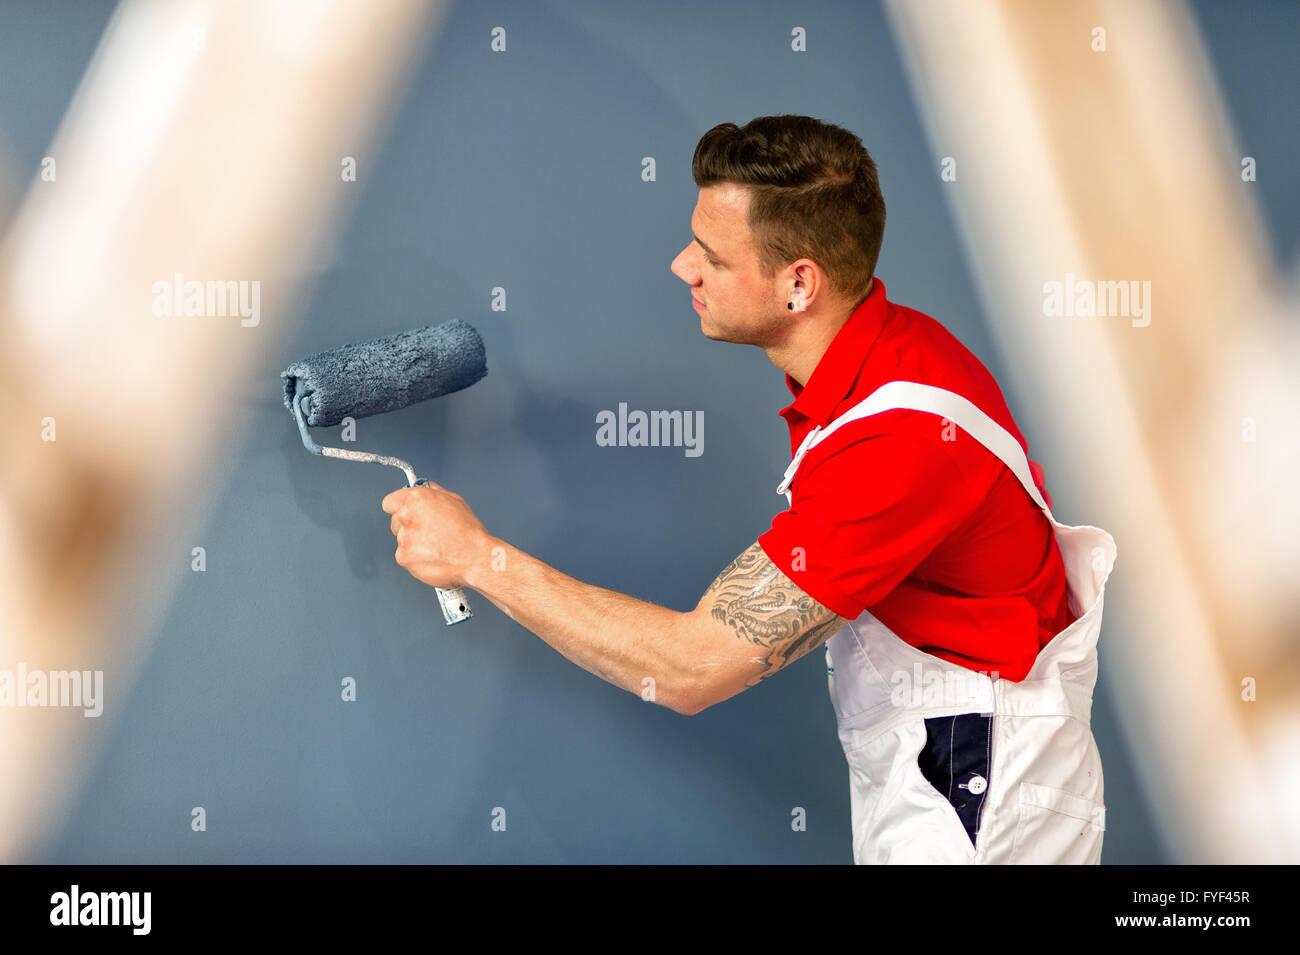 Painter on location - Stock Image